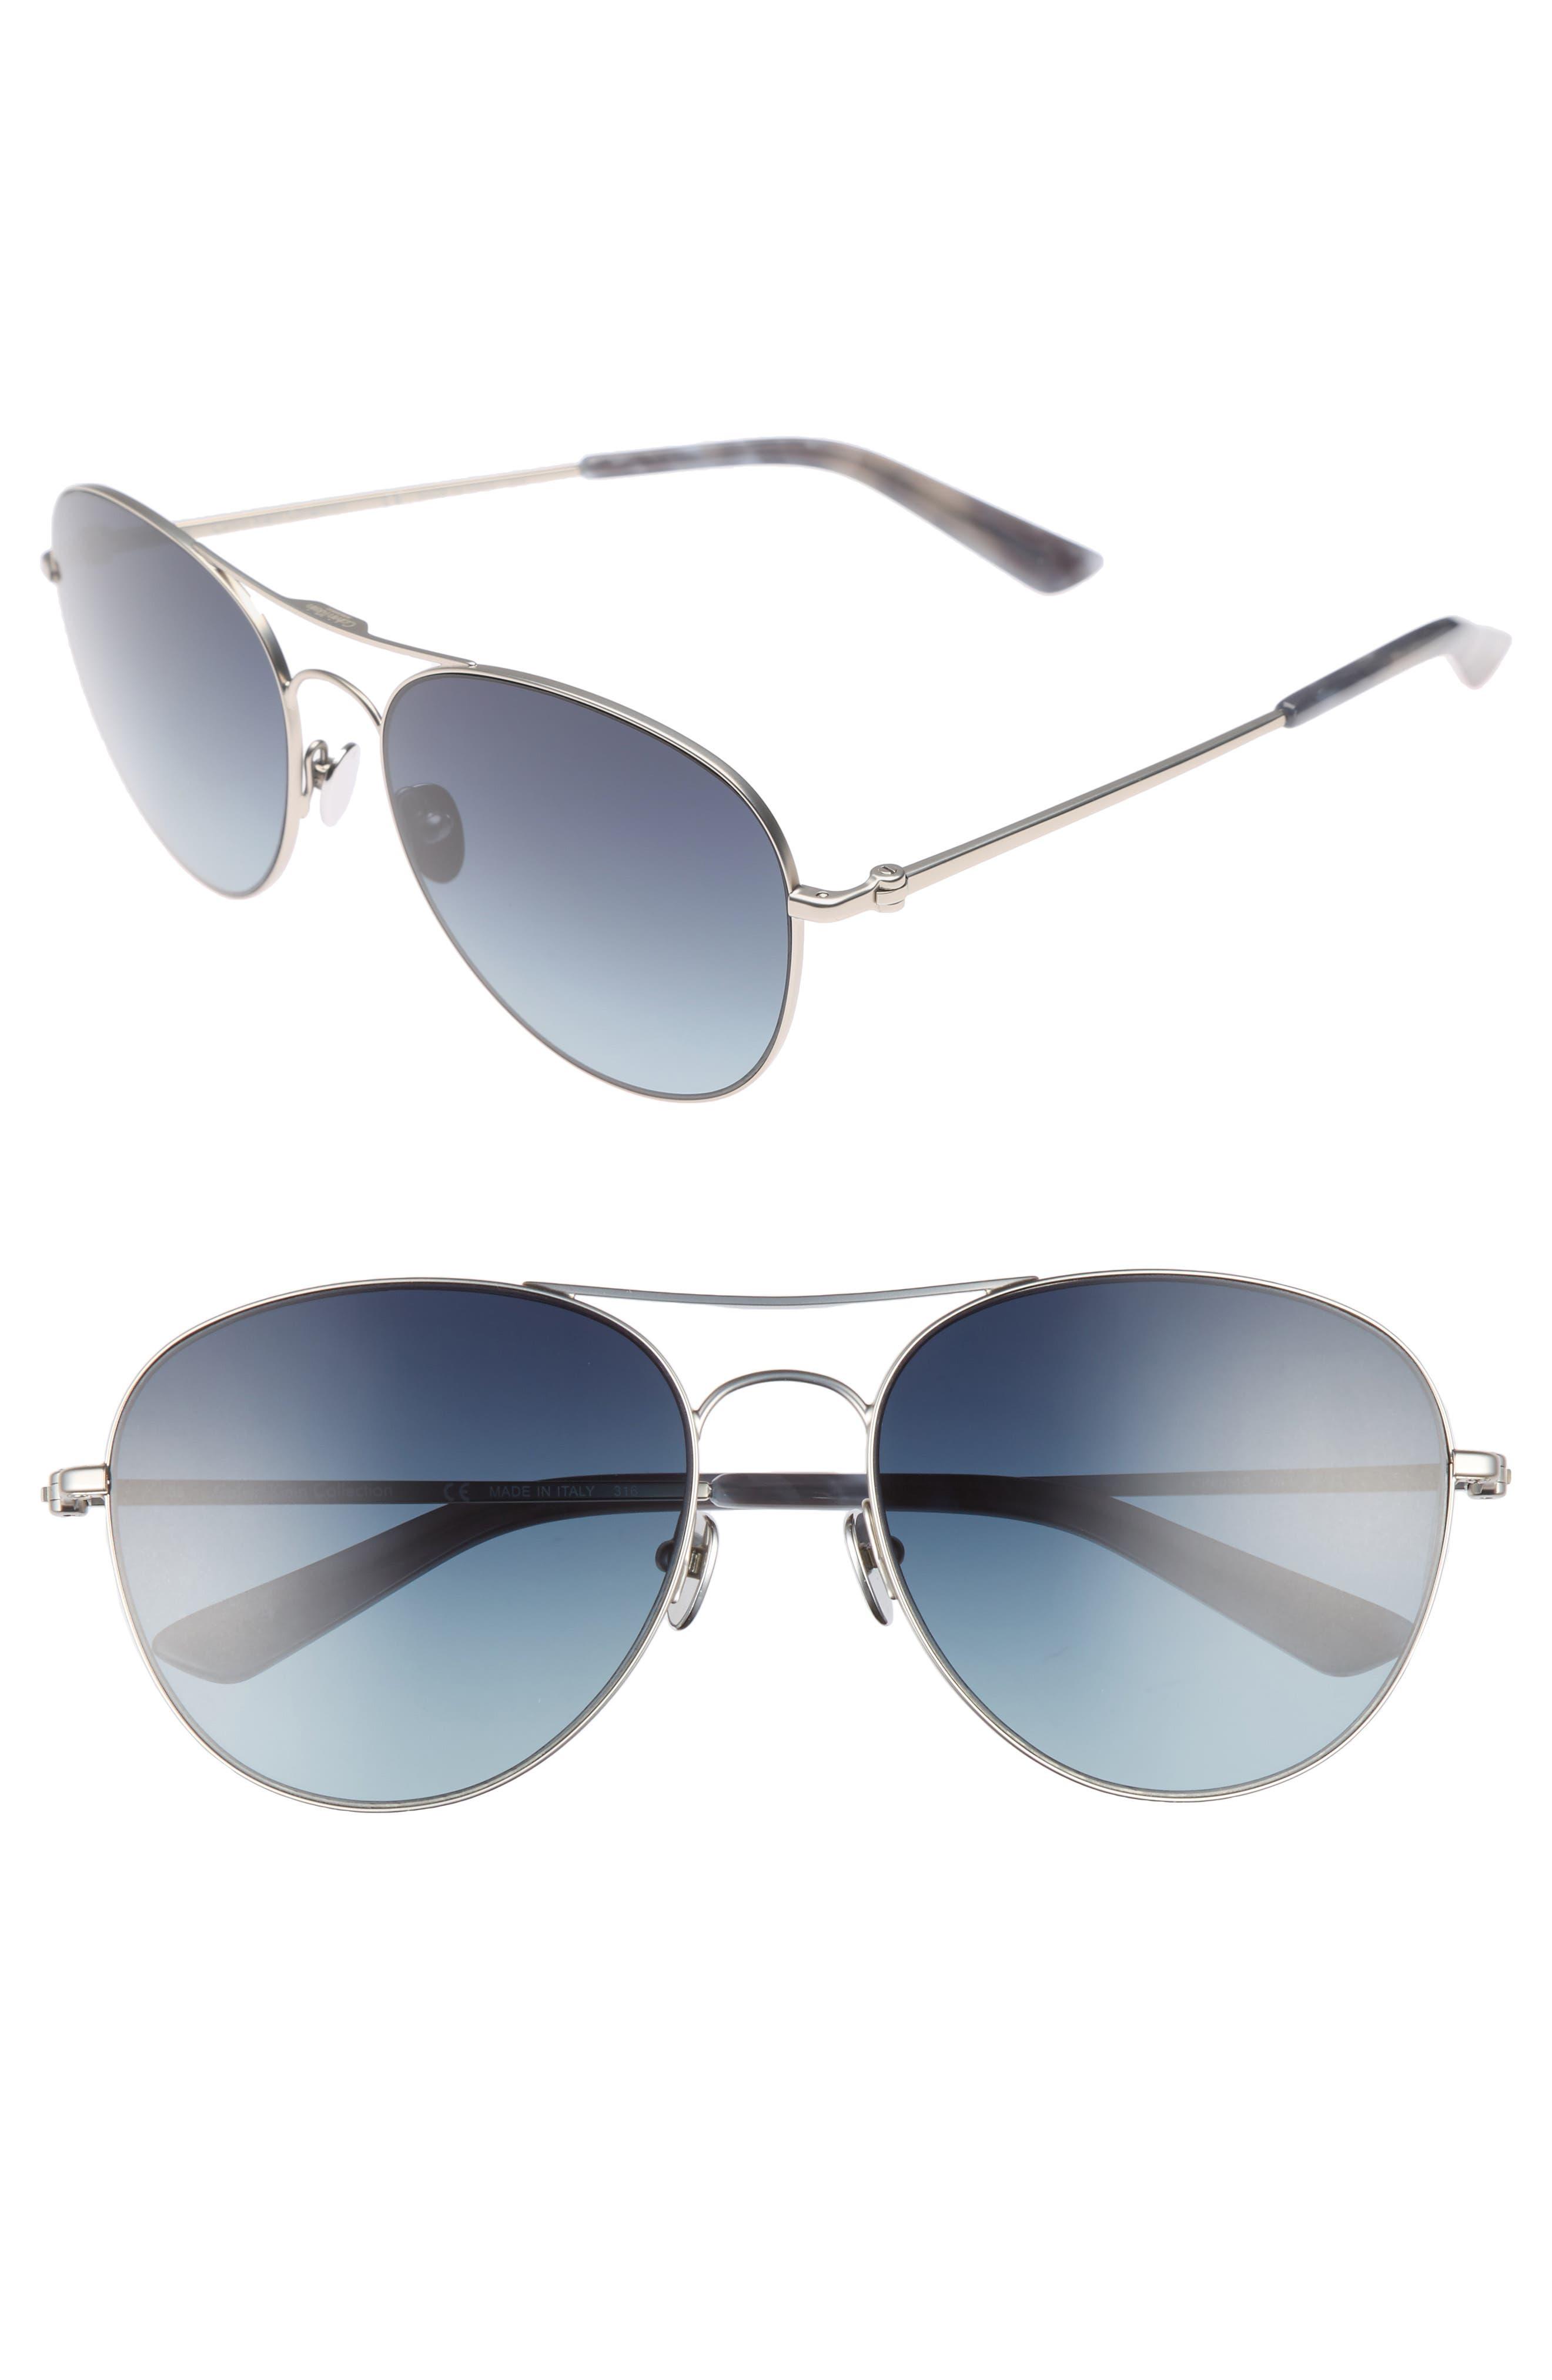 57mm Aviator Sunglasses,                             Main thumbnail 1, color,                             Satin Nickel